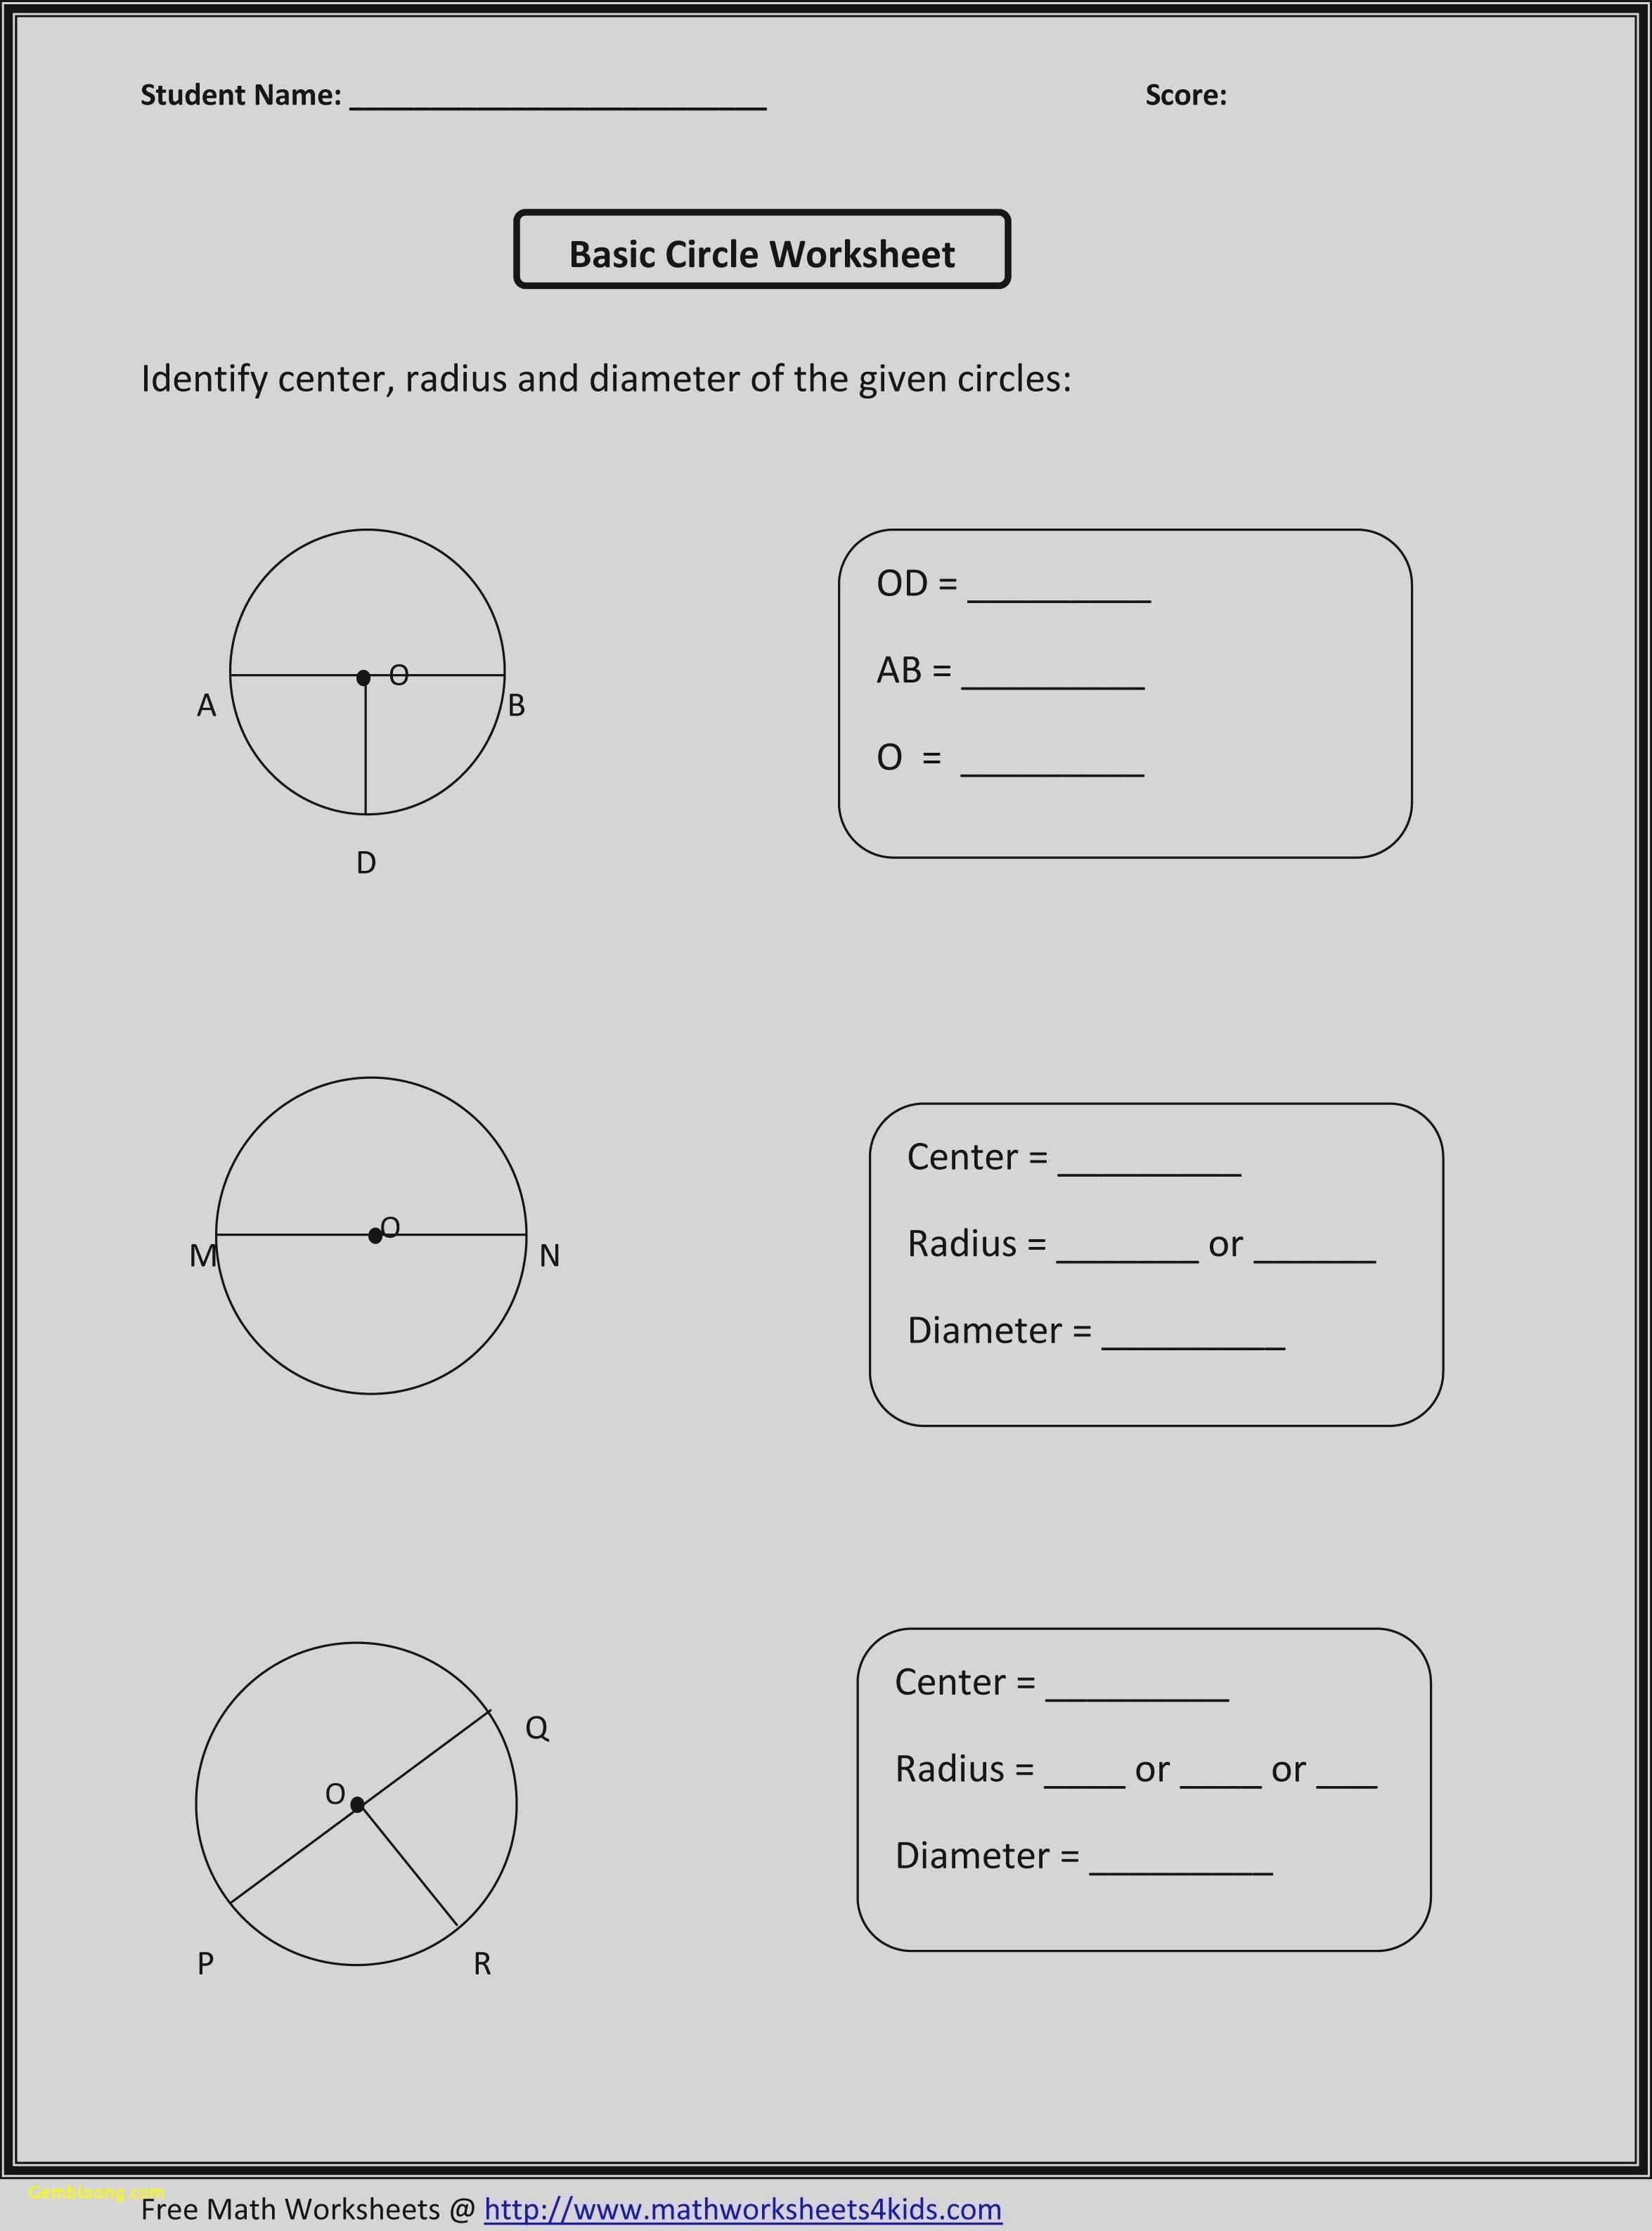 Bohr Model Worksheet Answers Best Of Bohr Model Practice Worksheet Answers Cramerforcongress